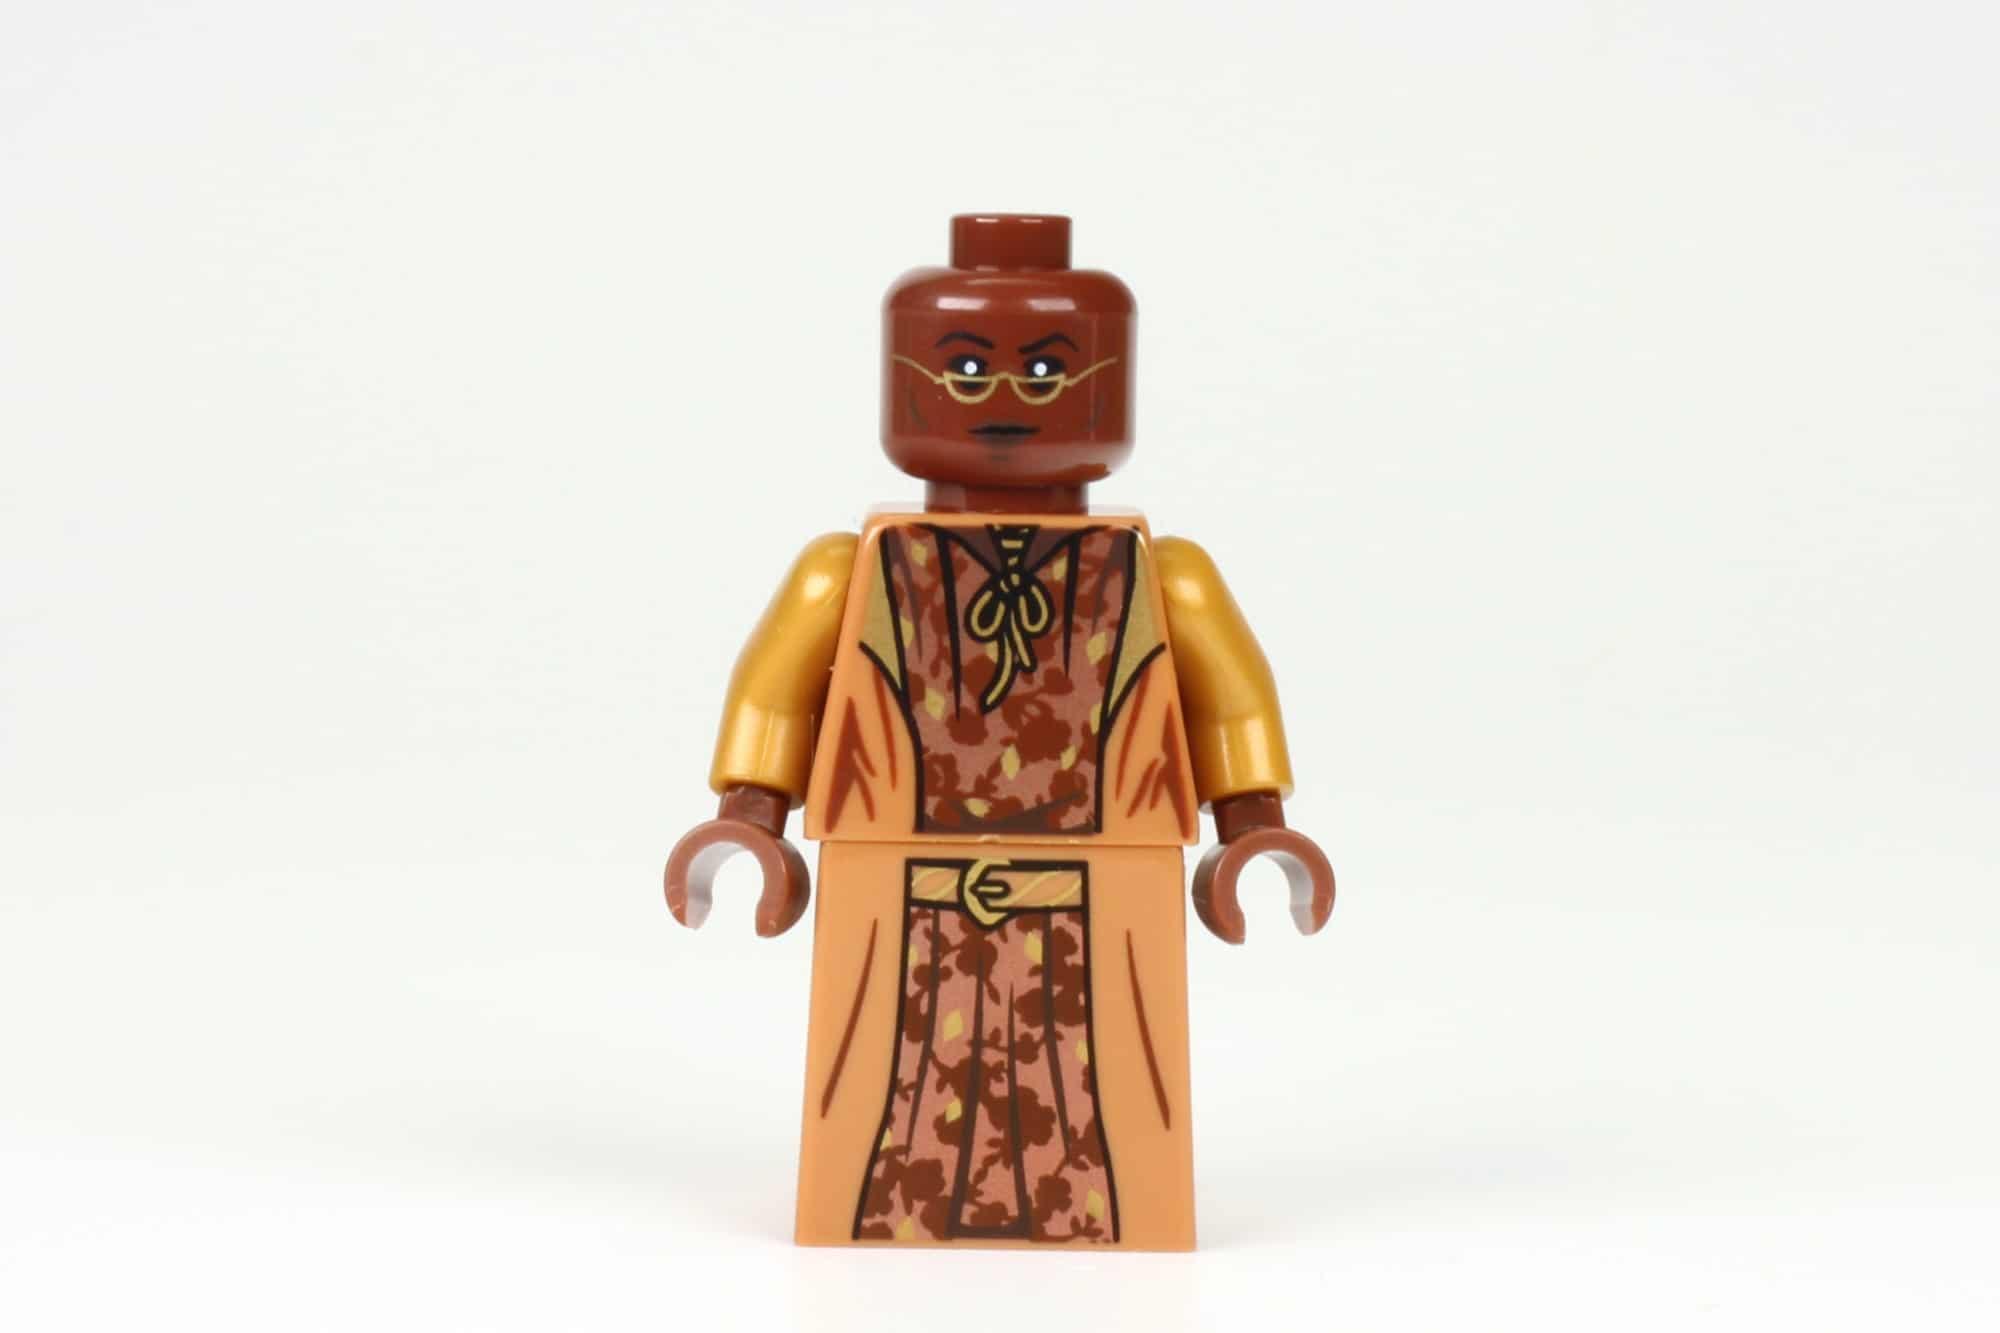 LEGO Harry Potter 76389 Hogwarts Kammer Des Schreckens Minifiguren 7 2